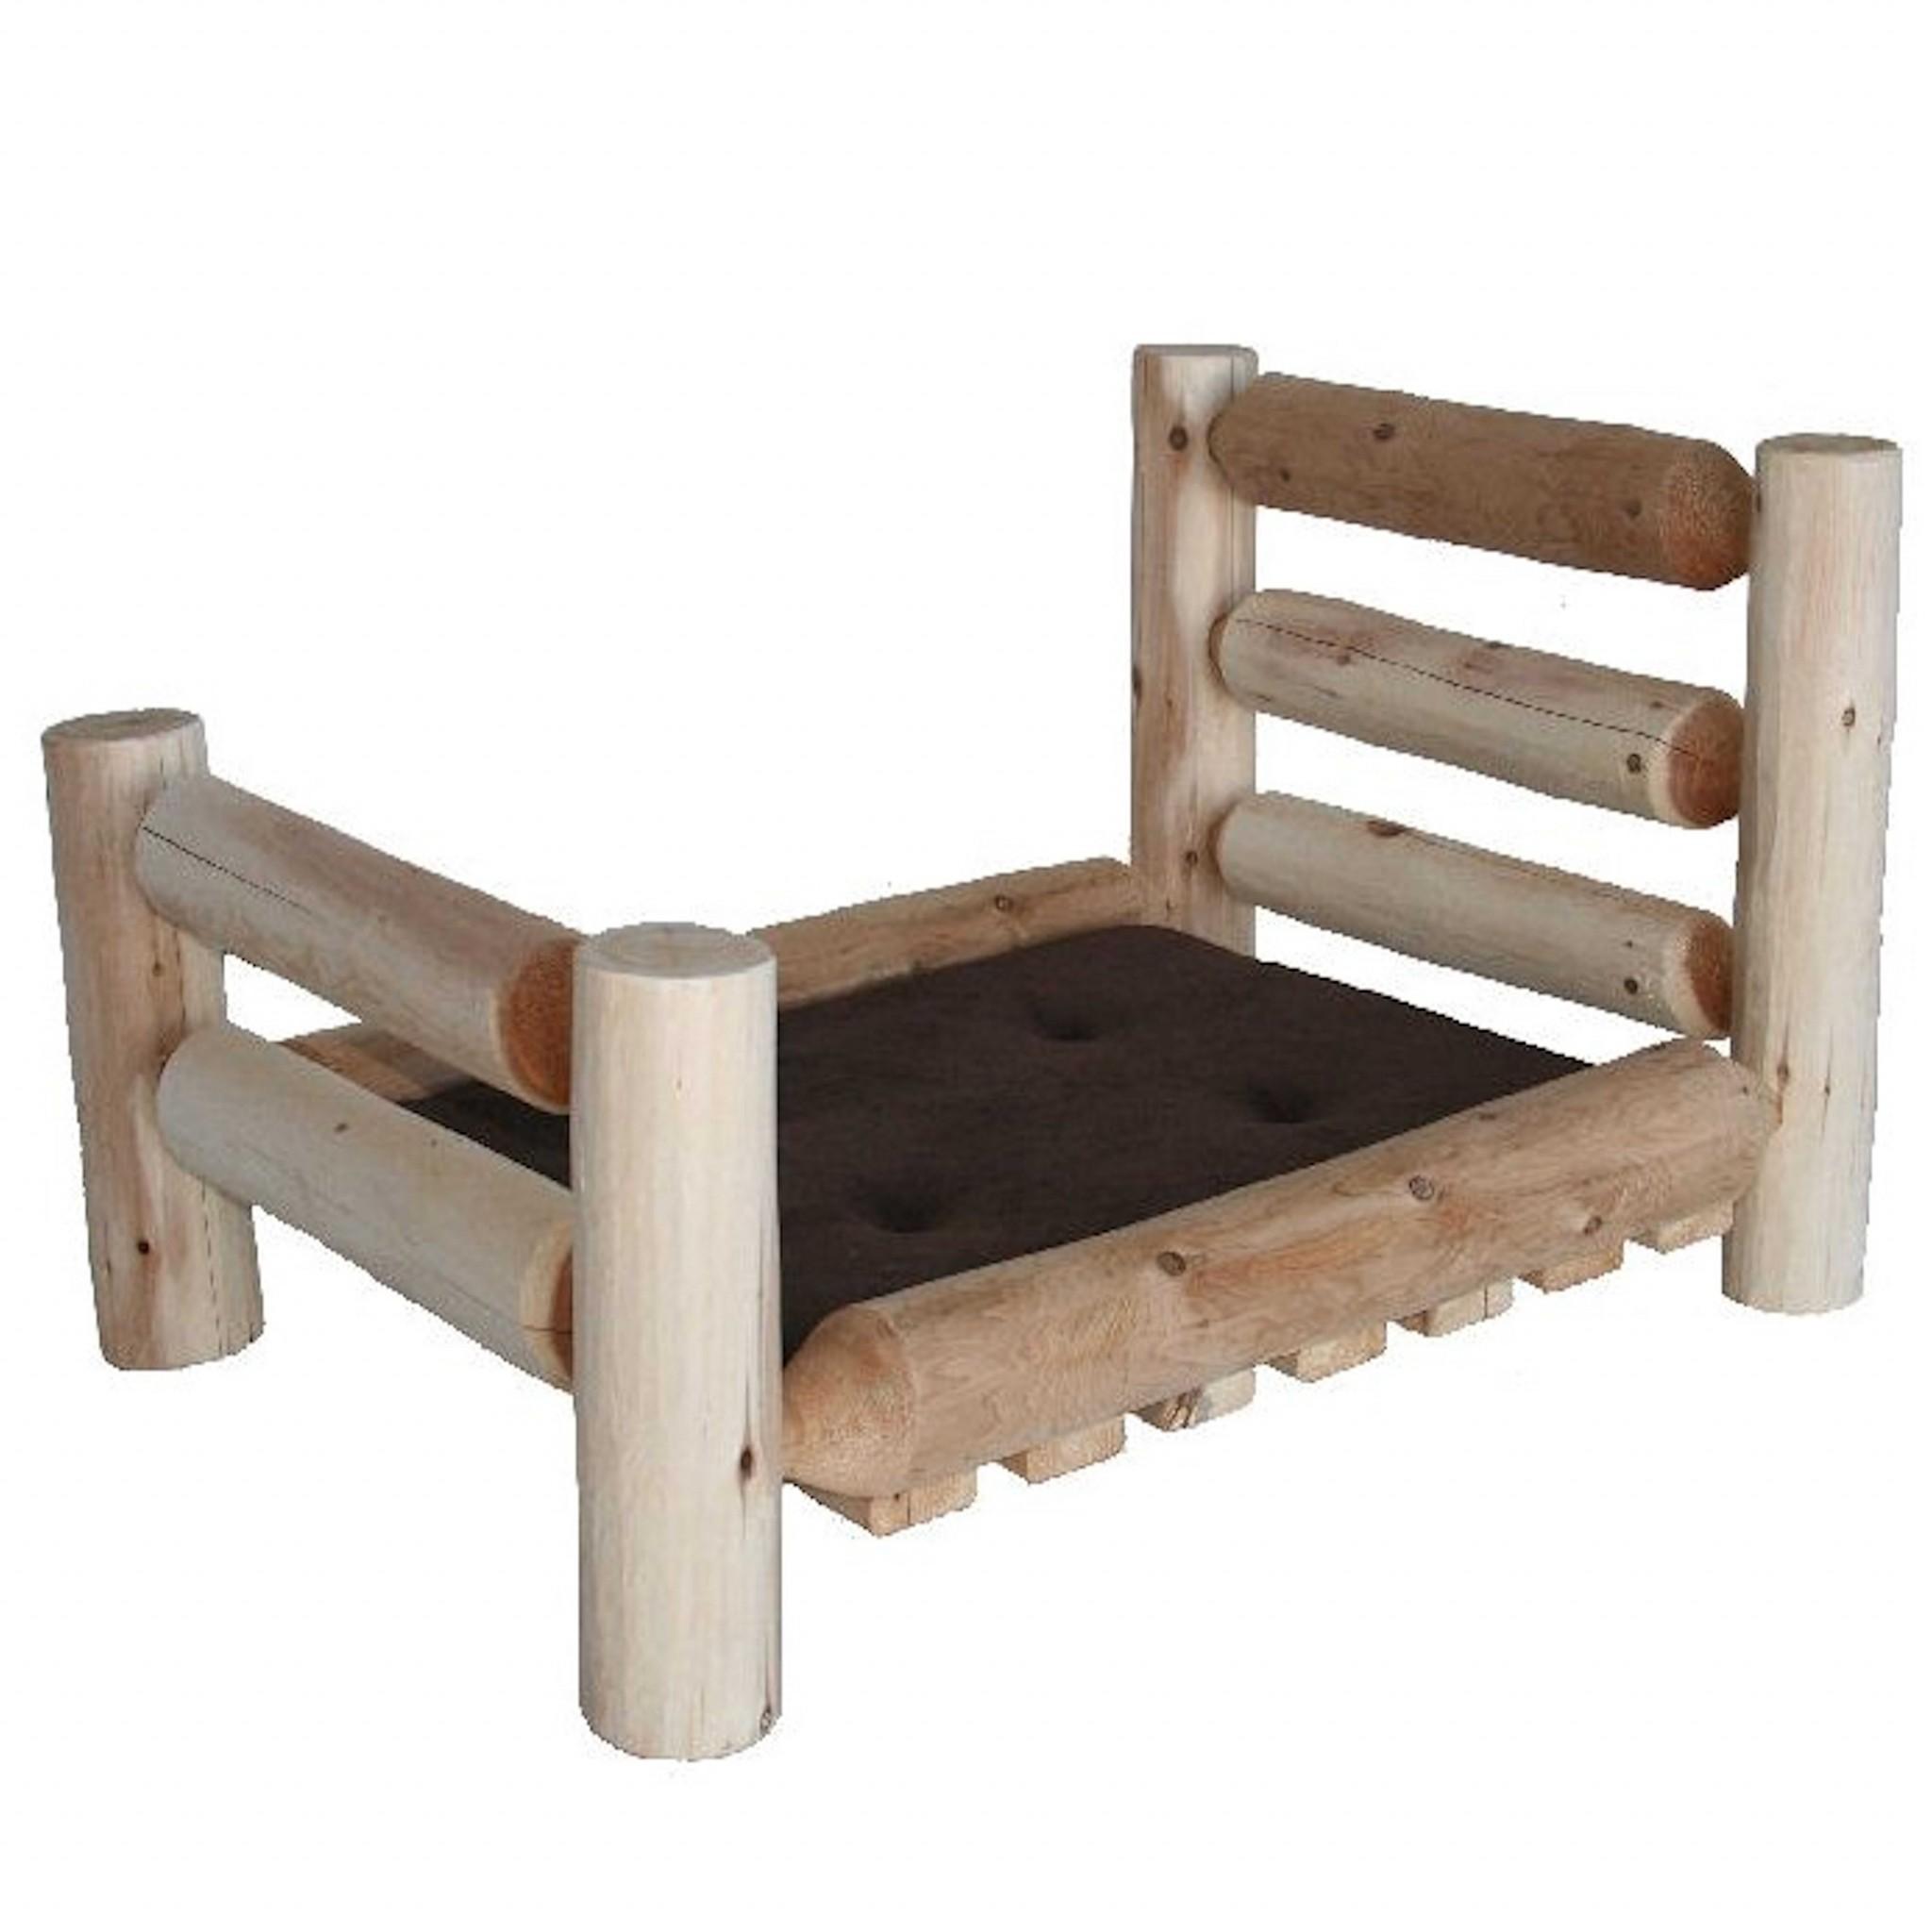 Rustic and Natural Cedar Log Small Replica Pet Bed